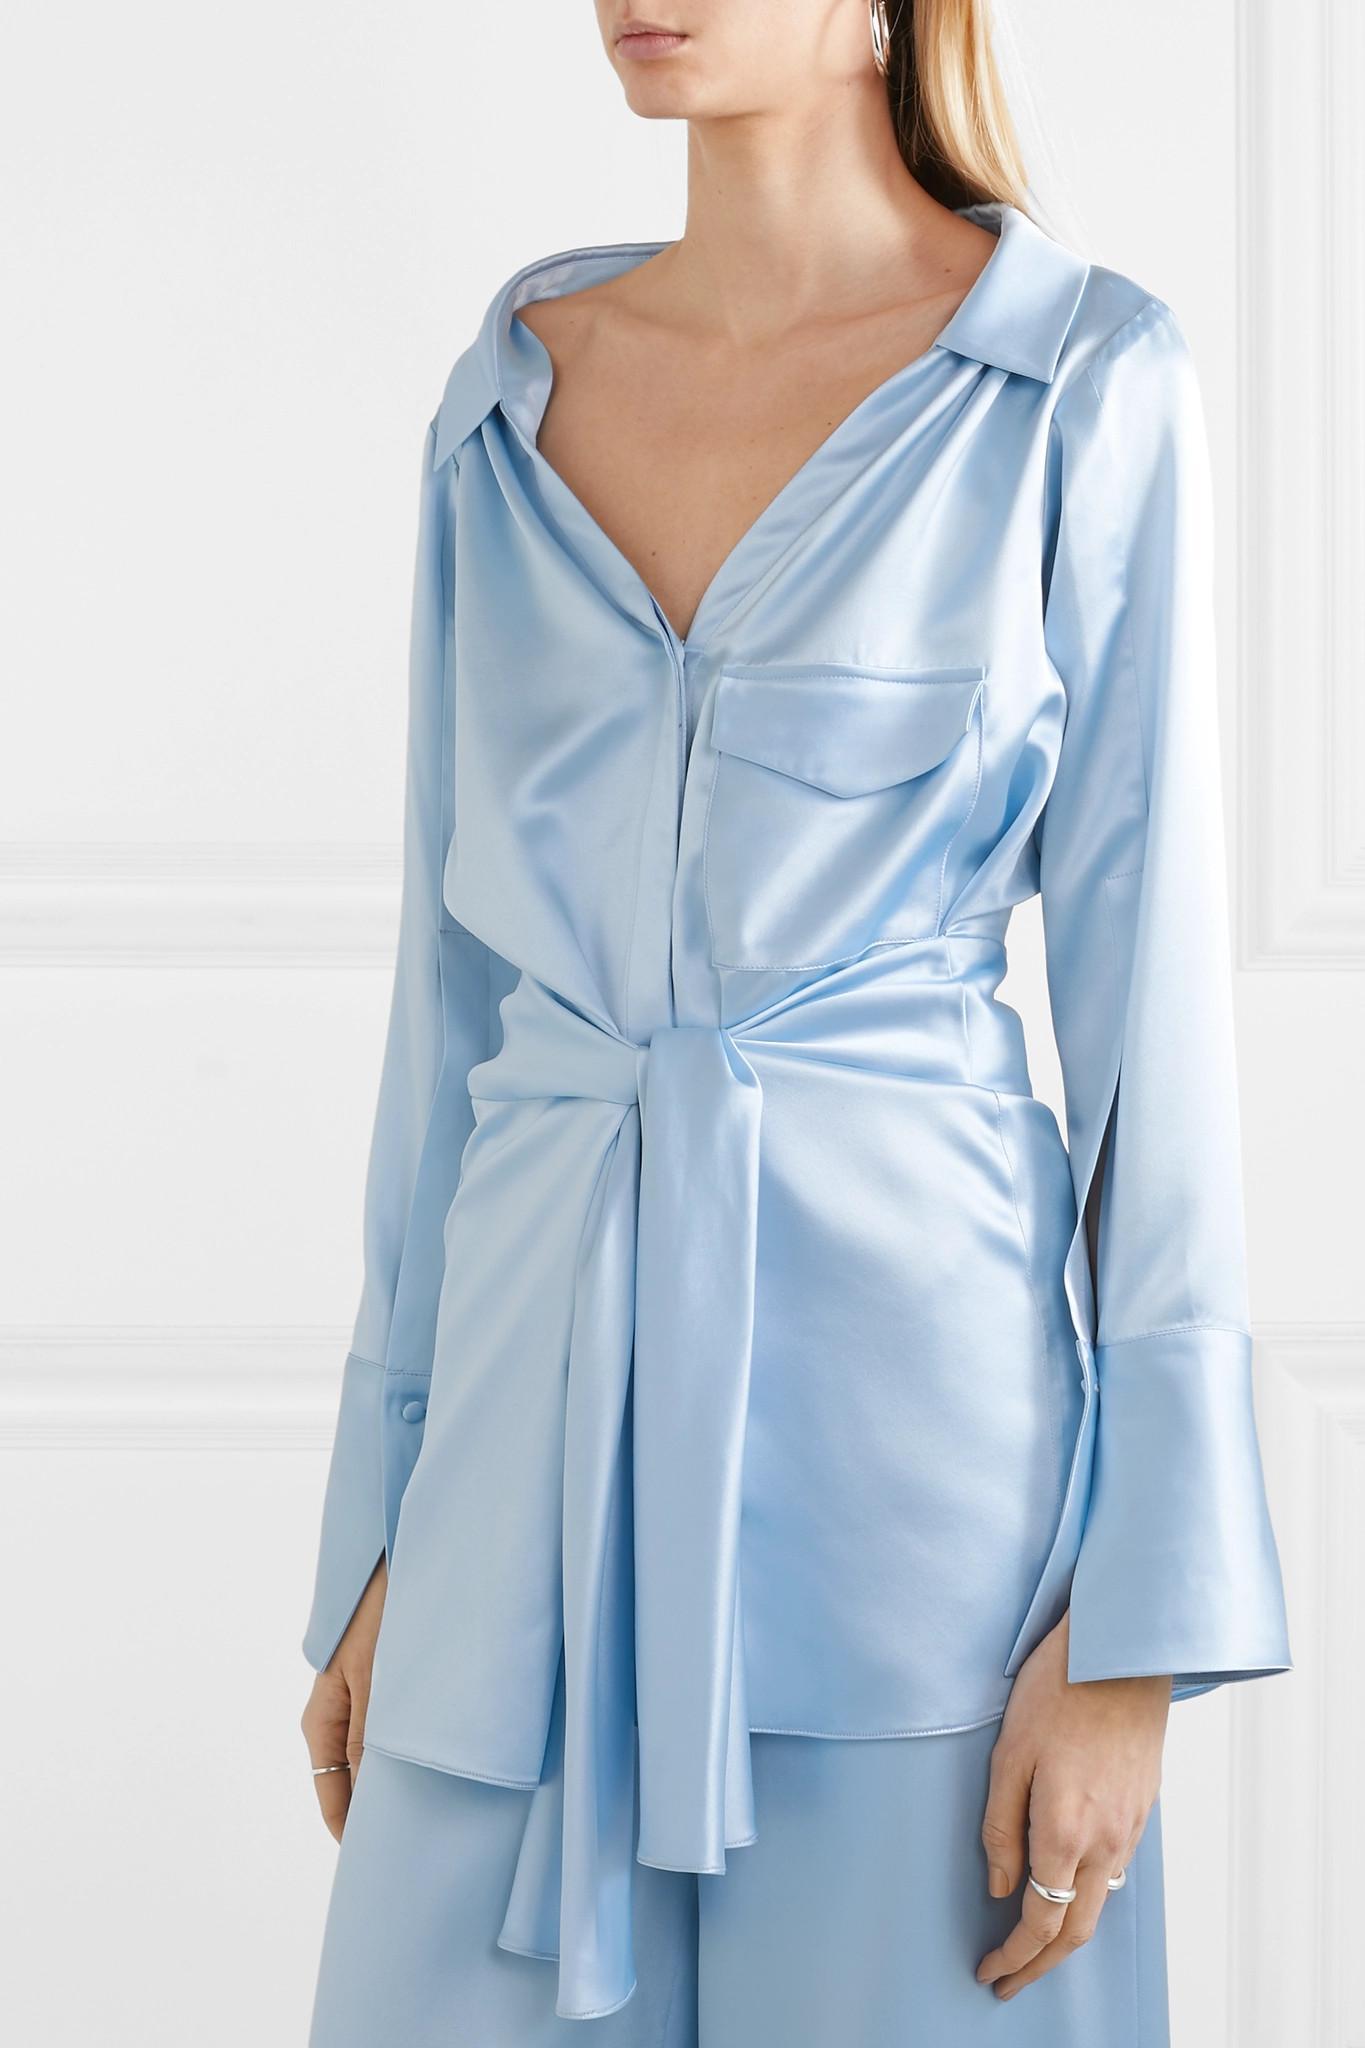 ce48c8334e8fa7 Hellessy - Blue Clark Belted Silk-satin Shirt - Lyst. View fullscreen